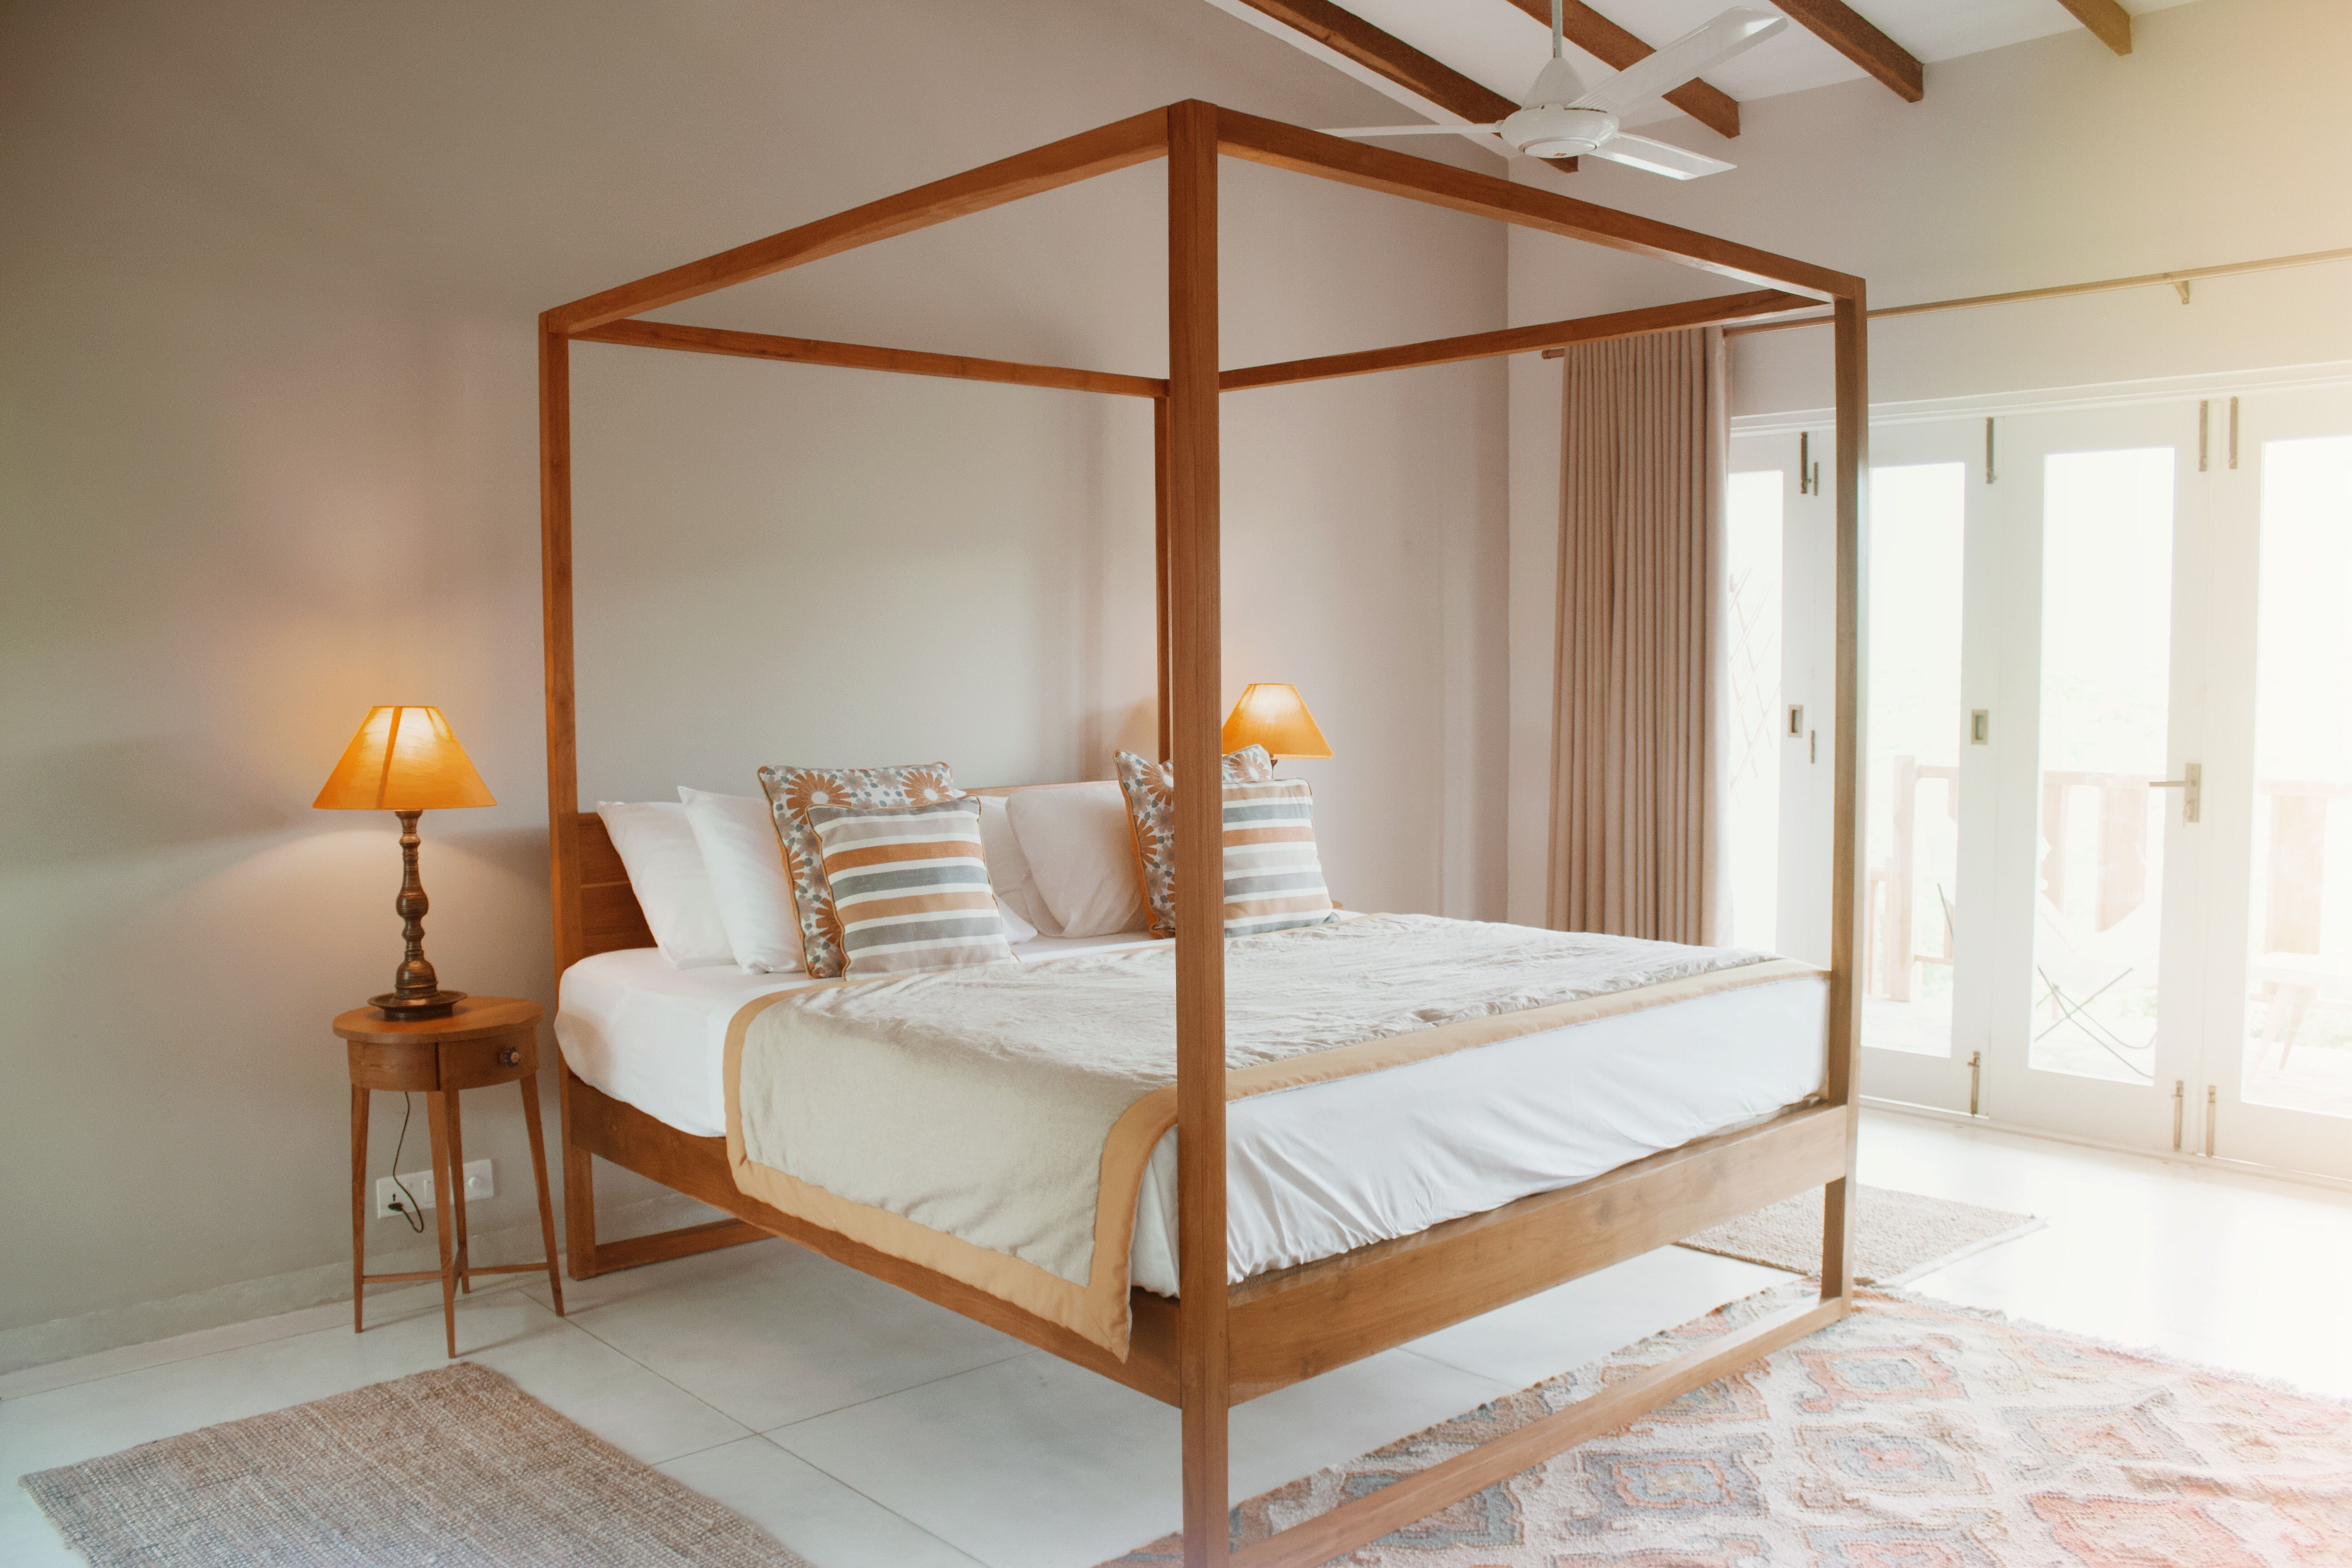 Rukgala Sri Lanka Furniture, Home decor, Decor